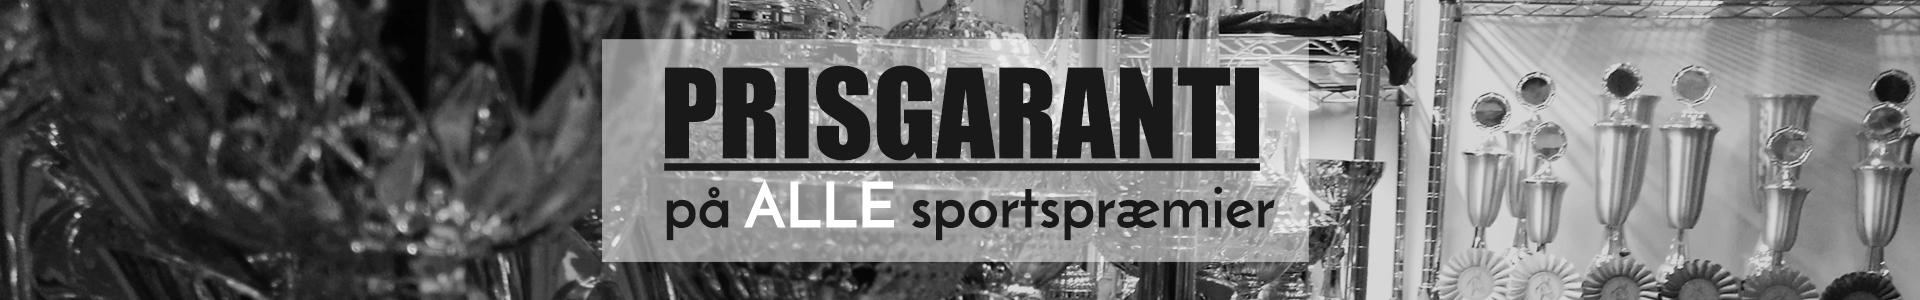 Prisgaranti på alle sportspræmier